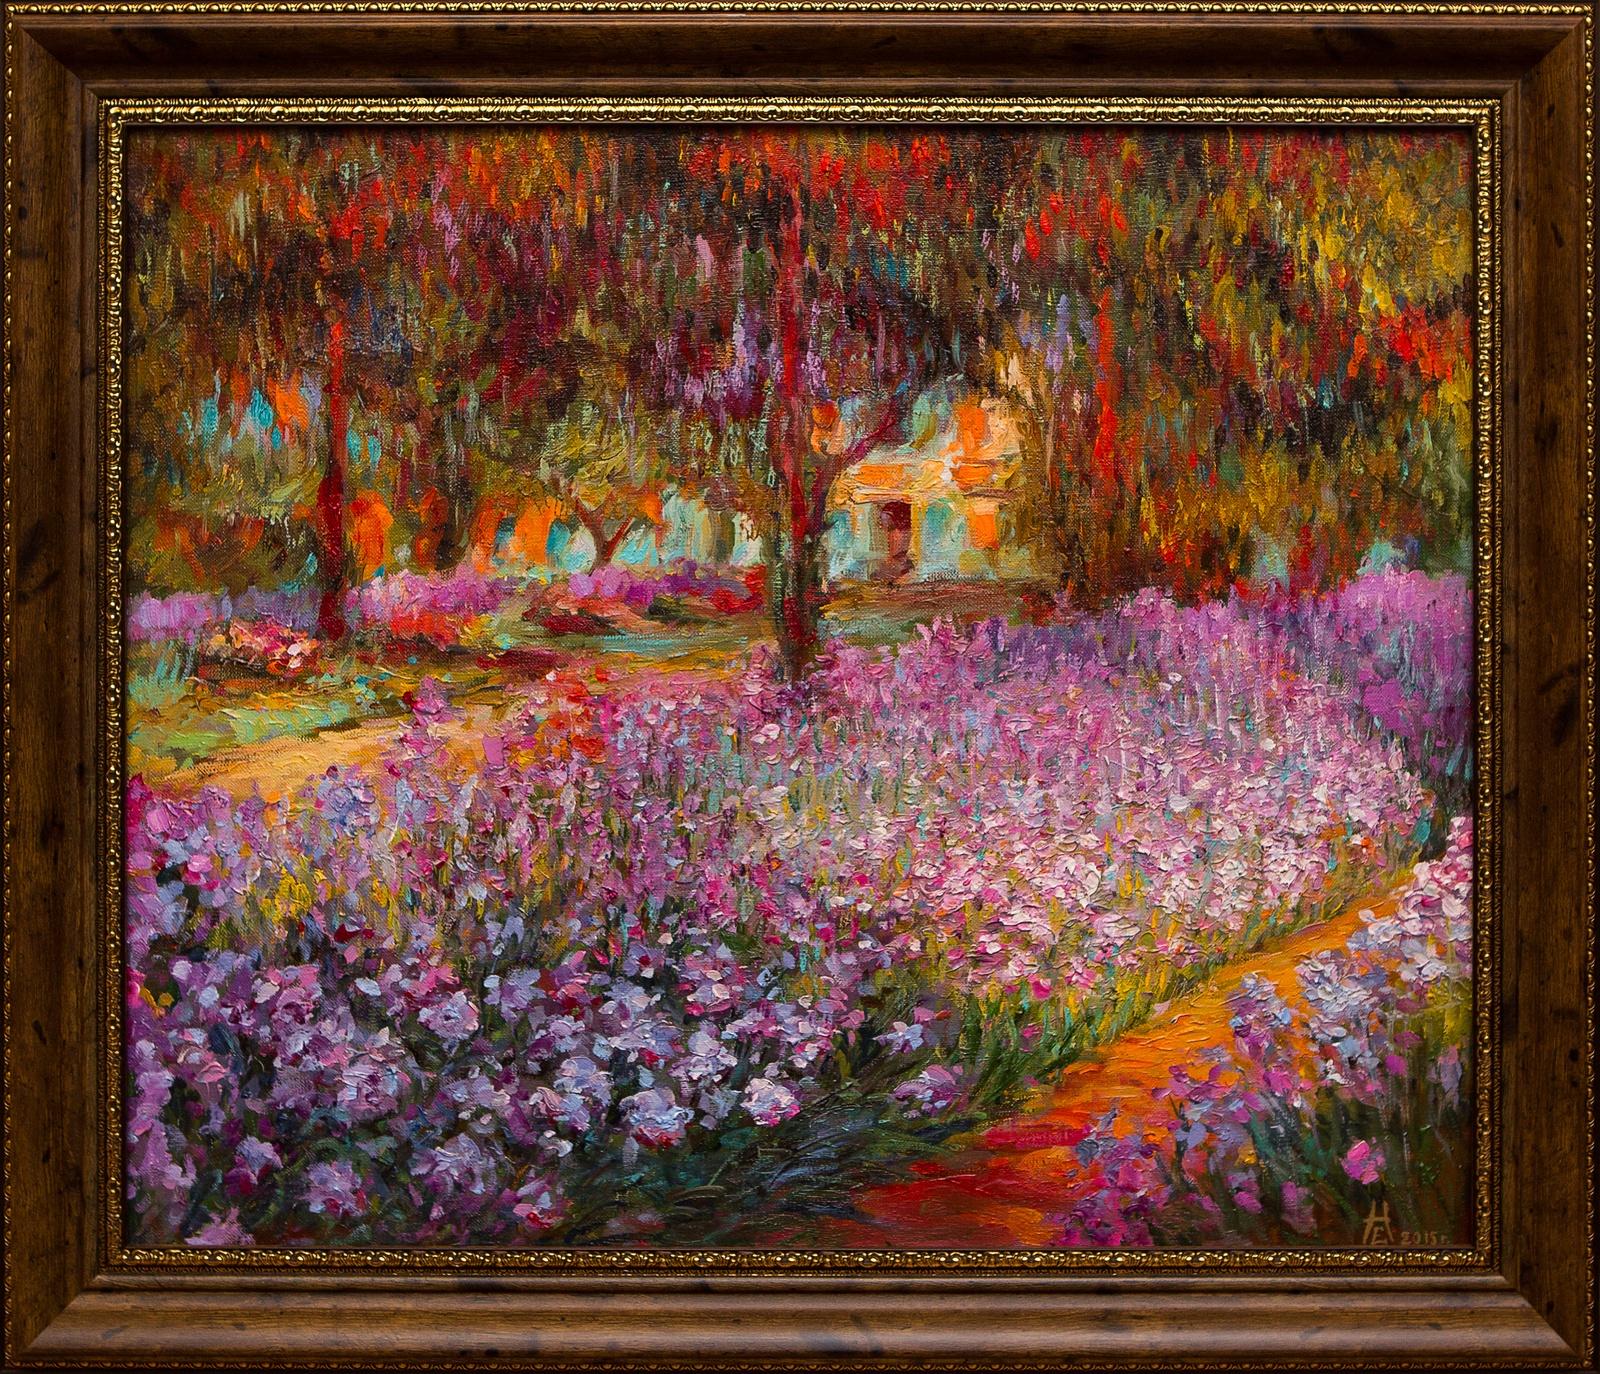 Сад художника в Живерни е катерли некрасов